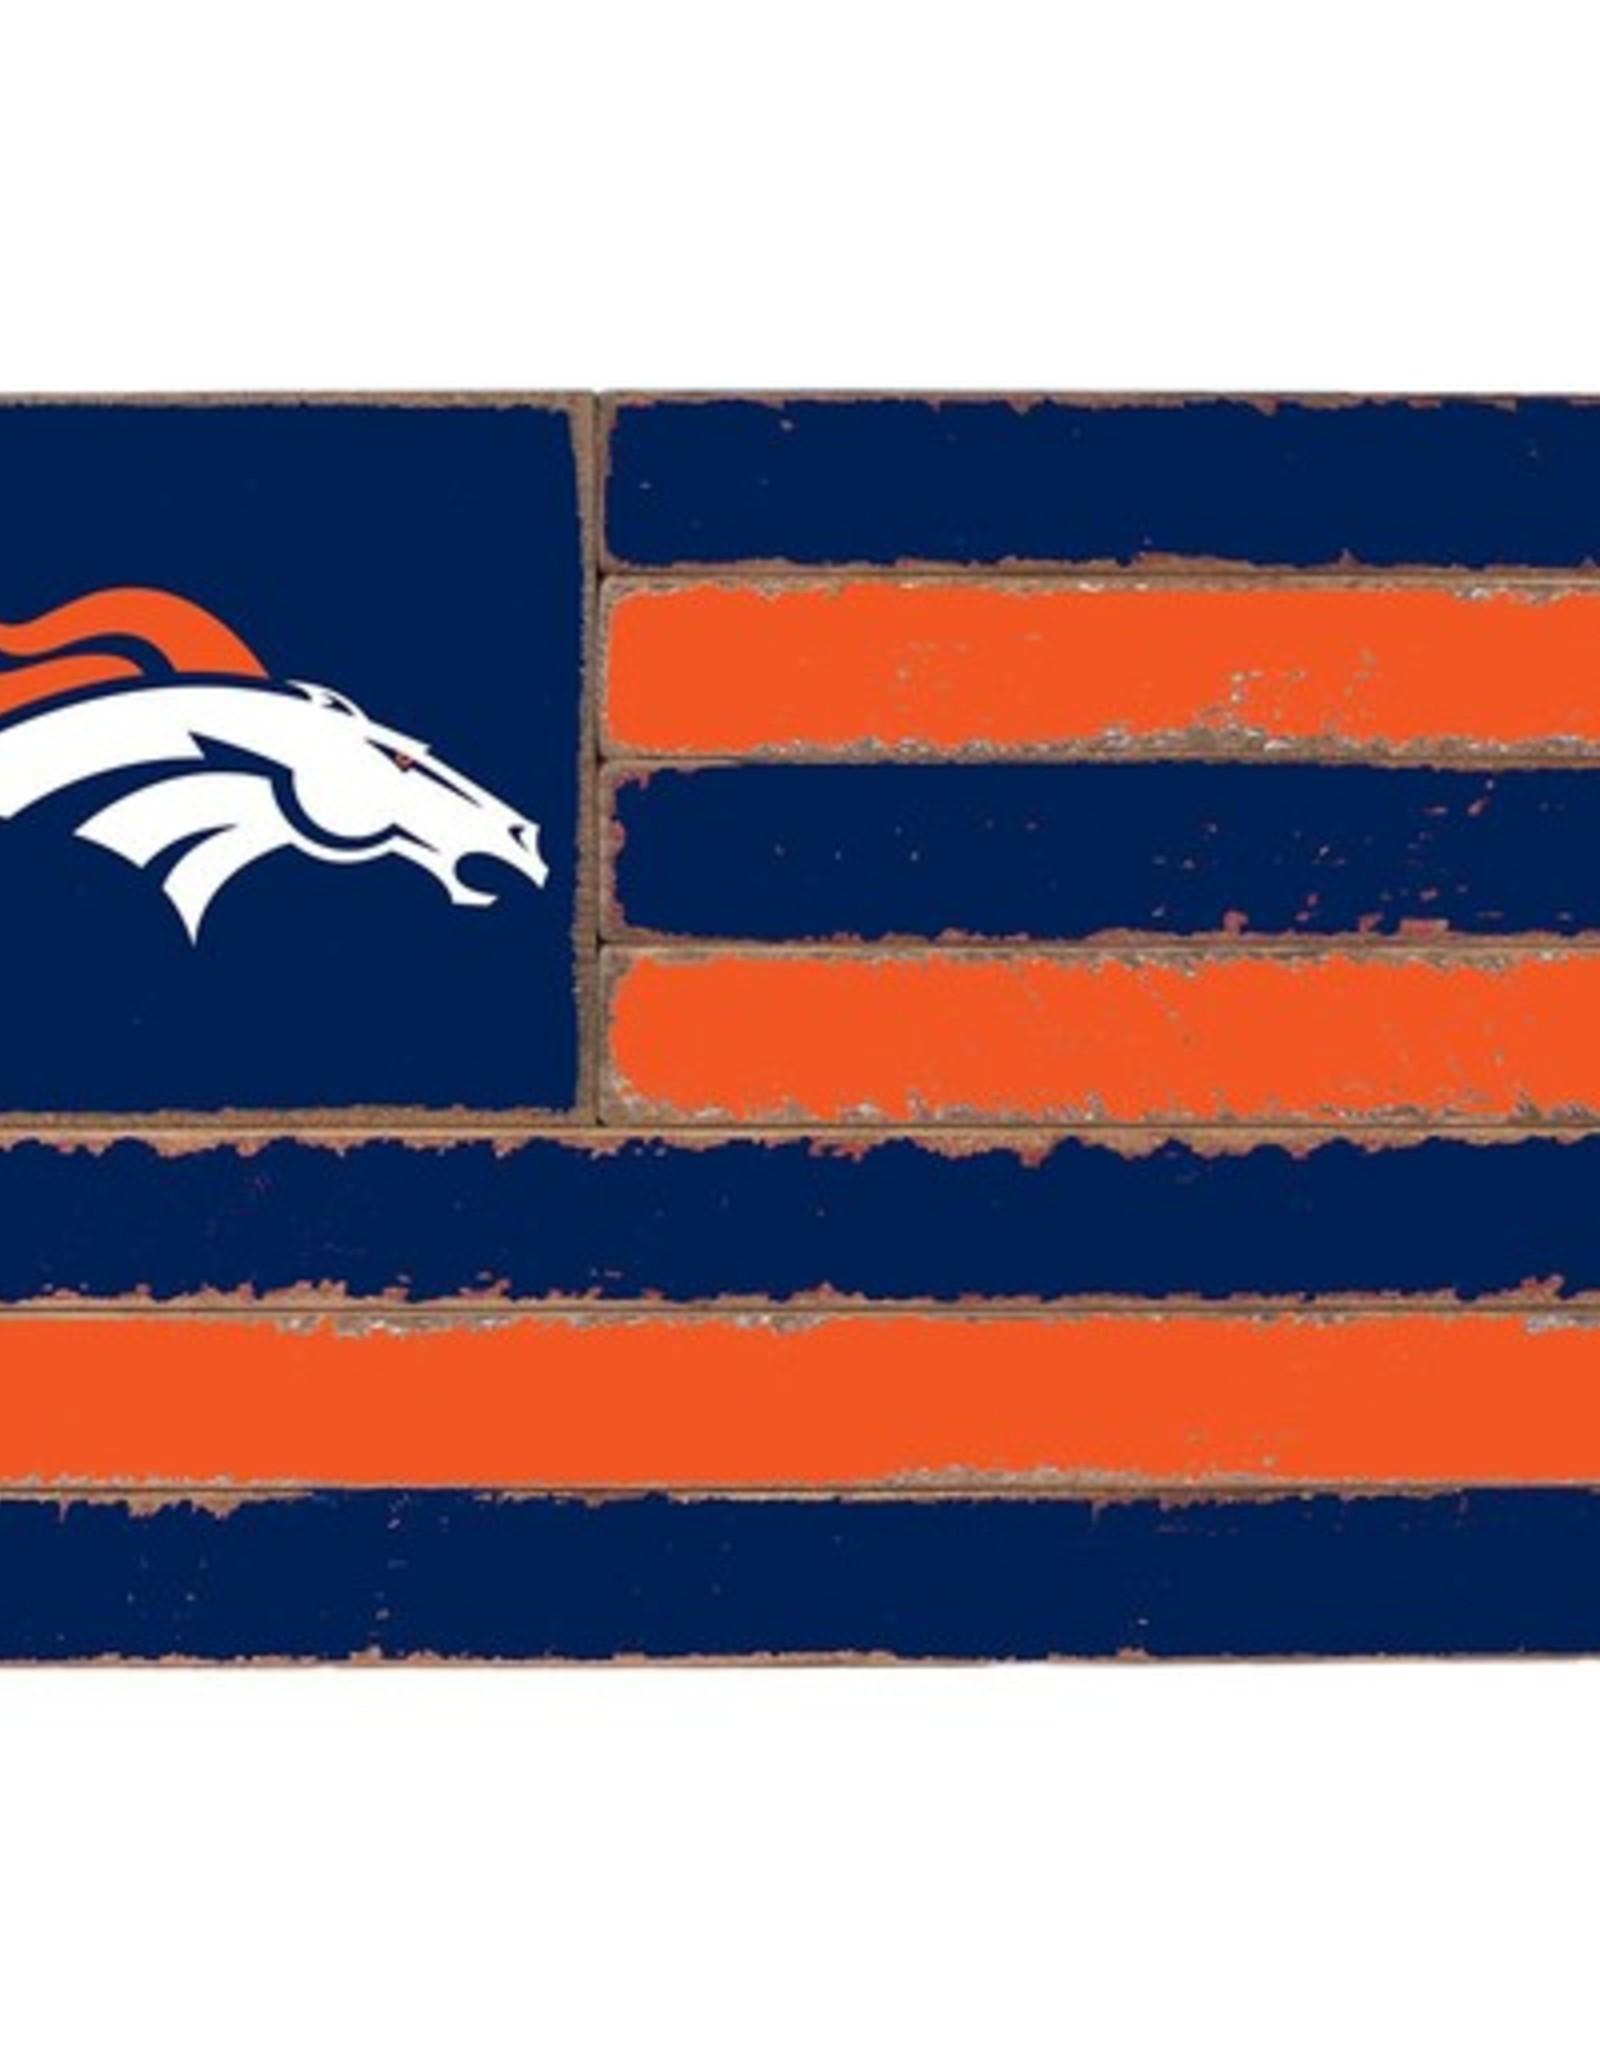 RUSTIC MARLIN Denver Broncos Rustic Team Flag